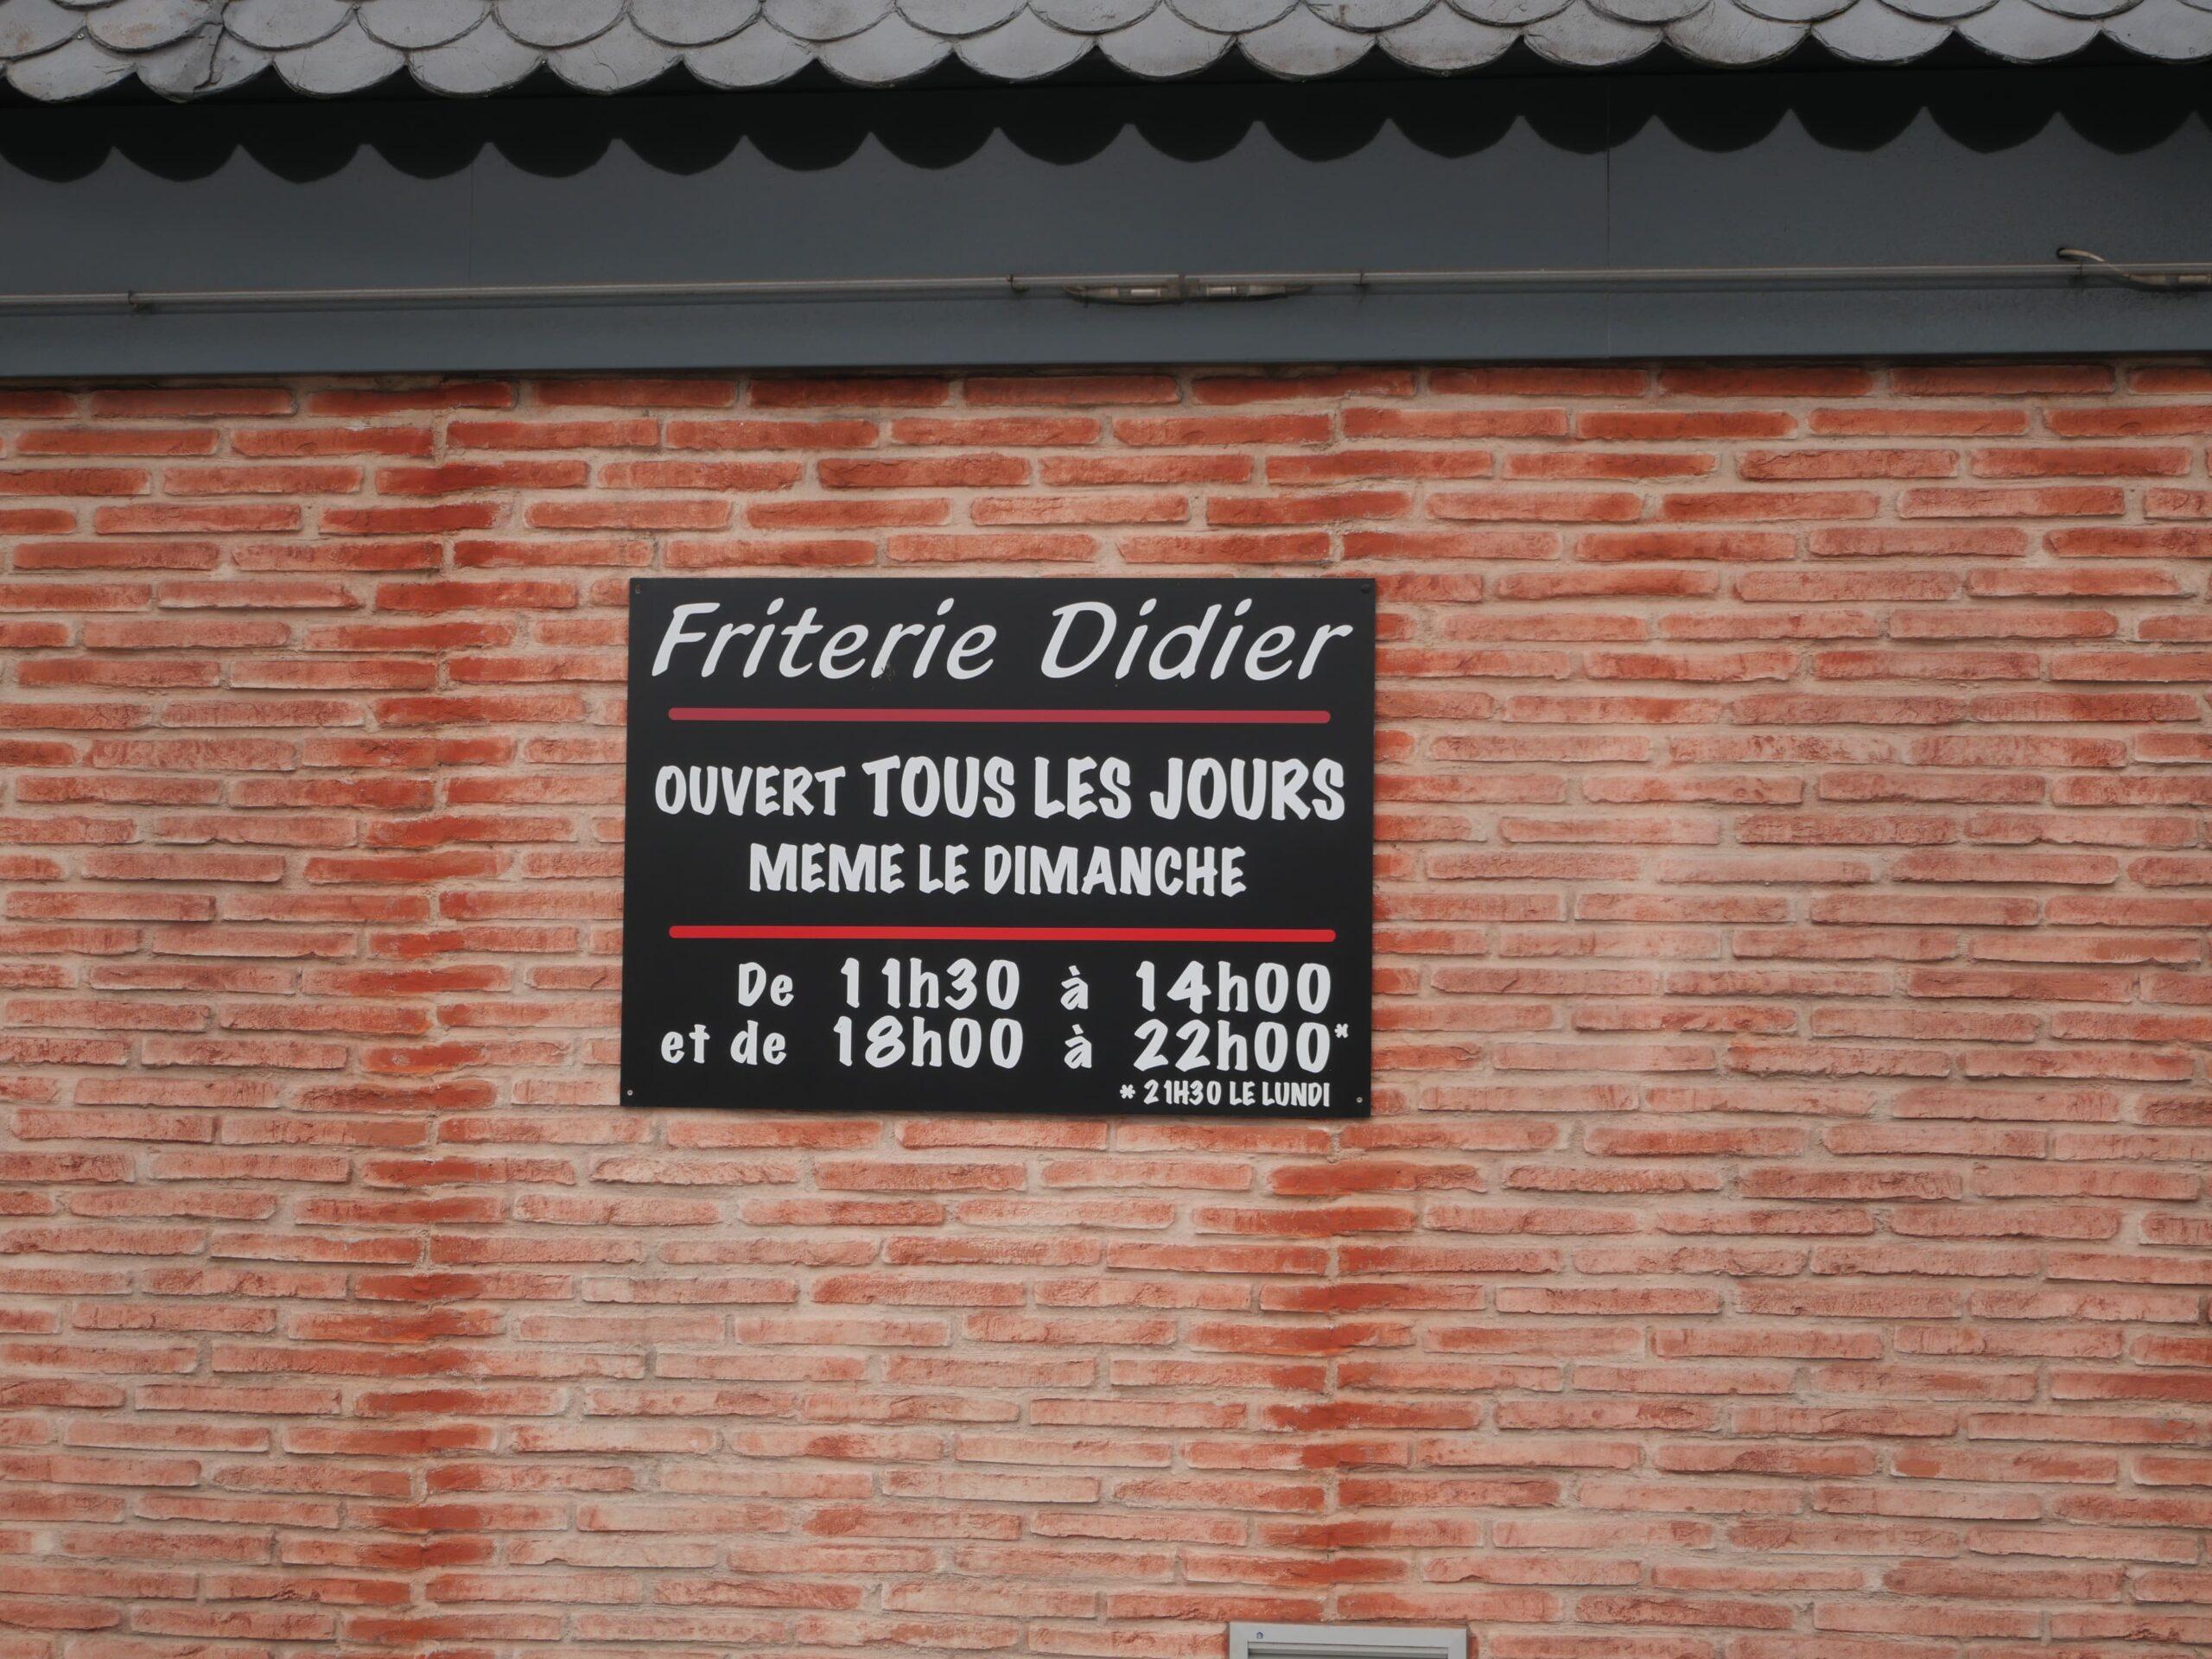 Friterie Didier